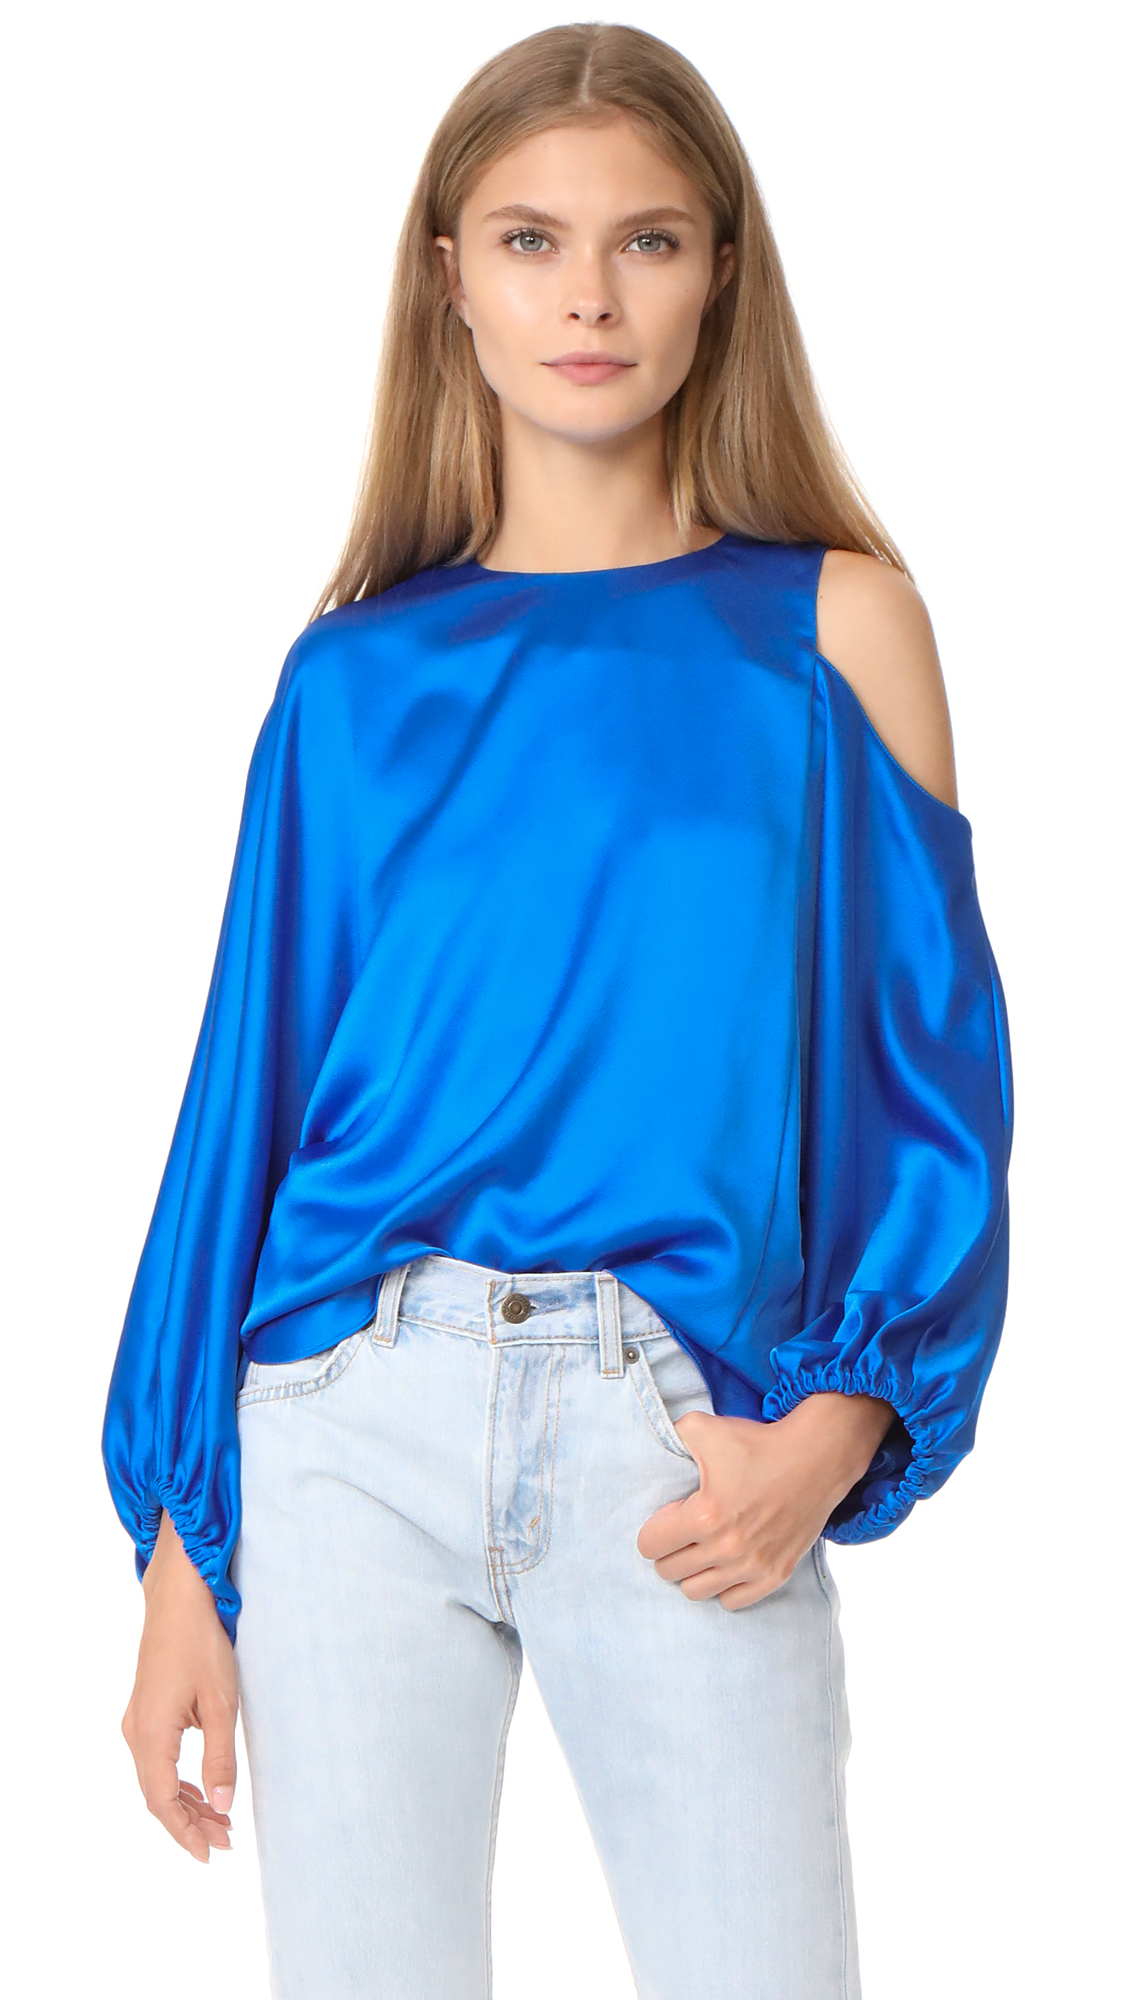 Tibi Celestia One Shoulder Top - Elbe Blue